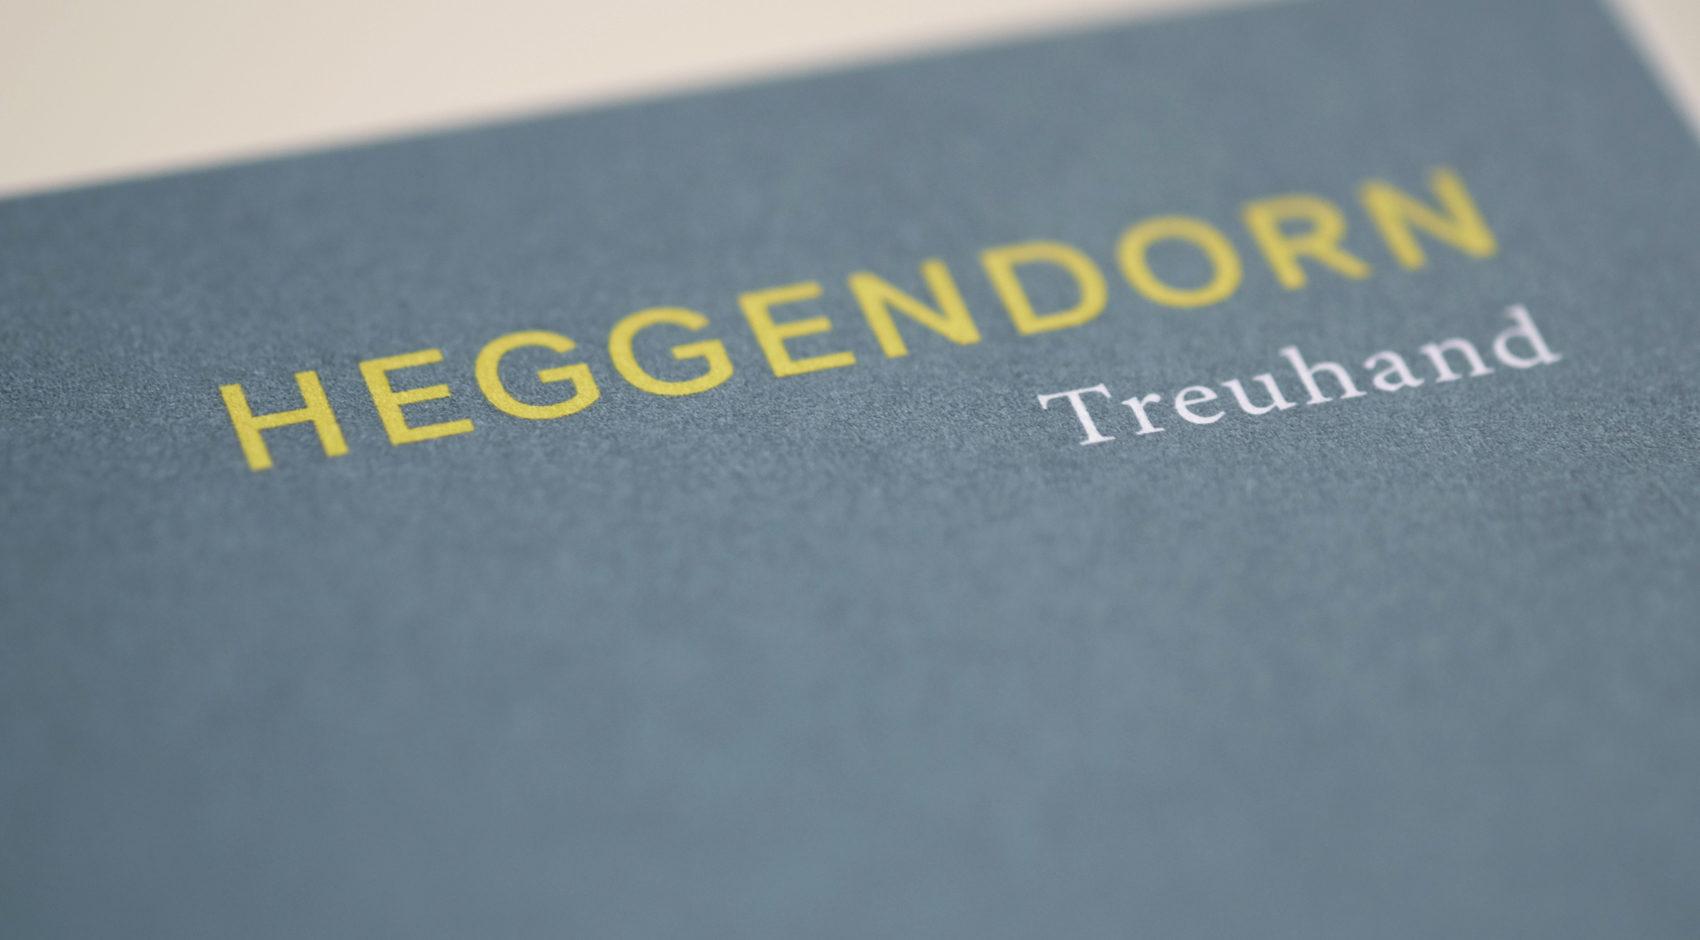 Webdesign Treuhand